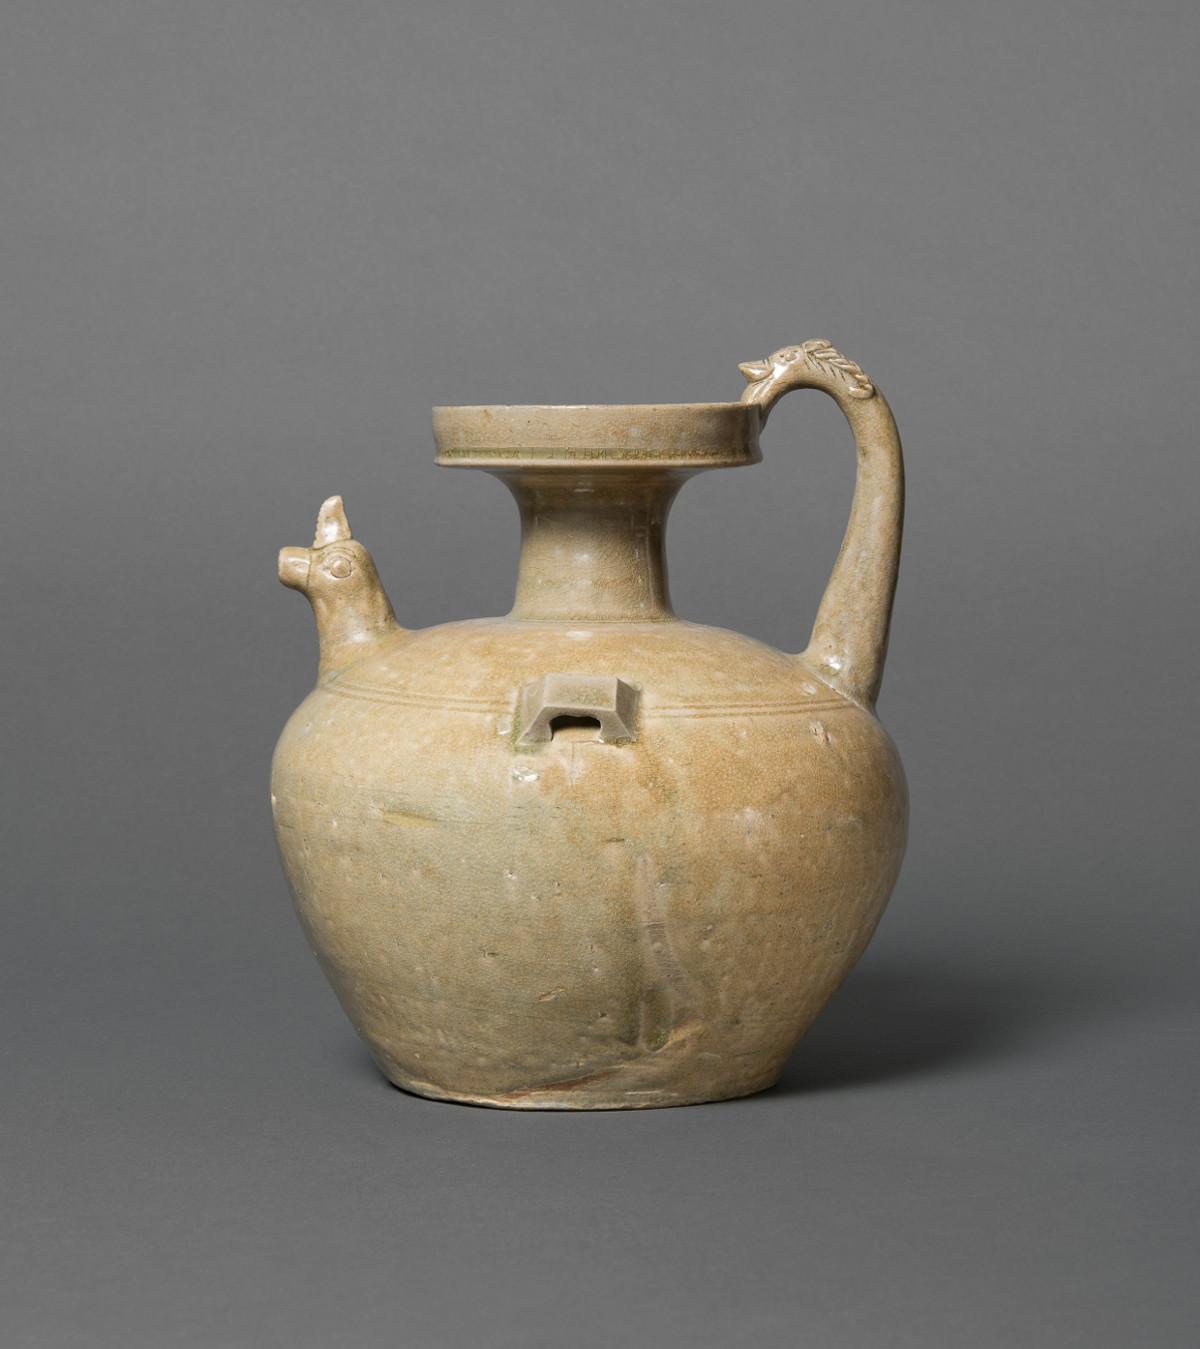 Hühnerkopfkanne, Proto-Seladon, China, Zeit der Sechs Dynastien (265–589), Schenkung Dr. Heribert Meurer, 2017. (Foto: Paul Altmann)